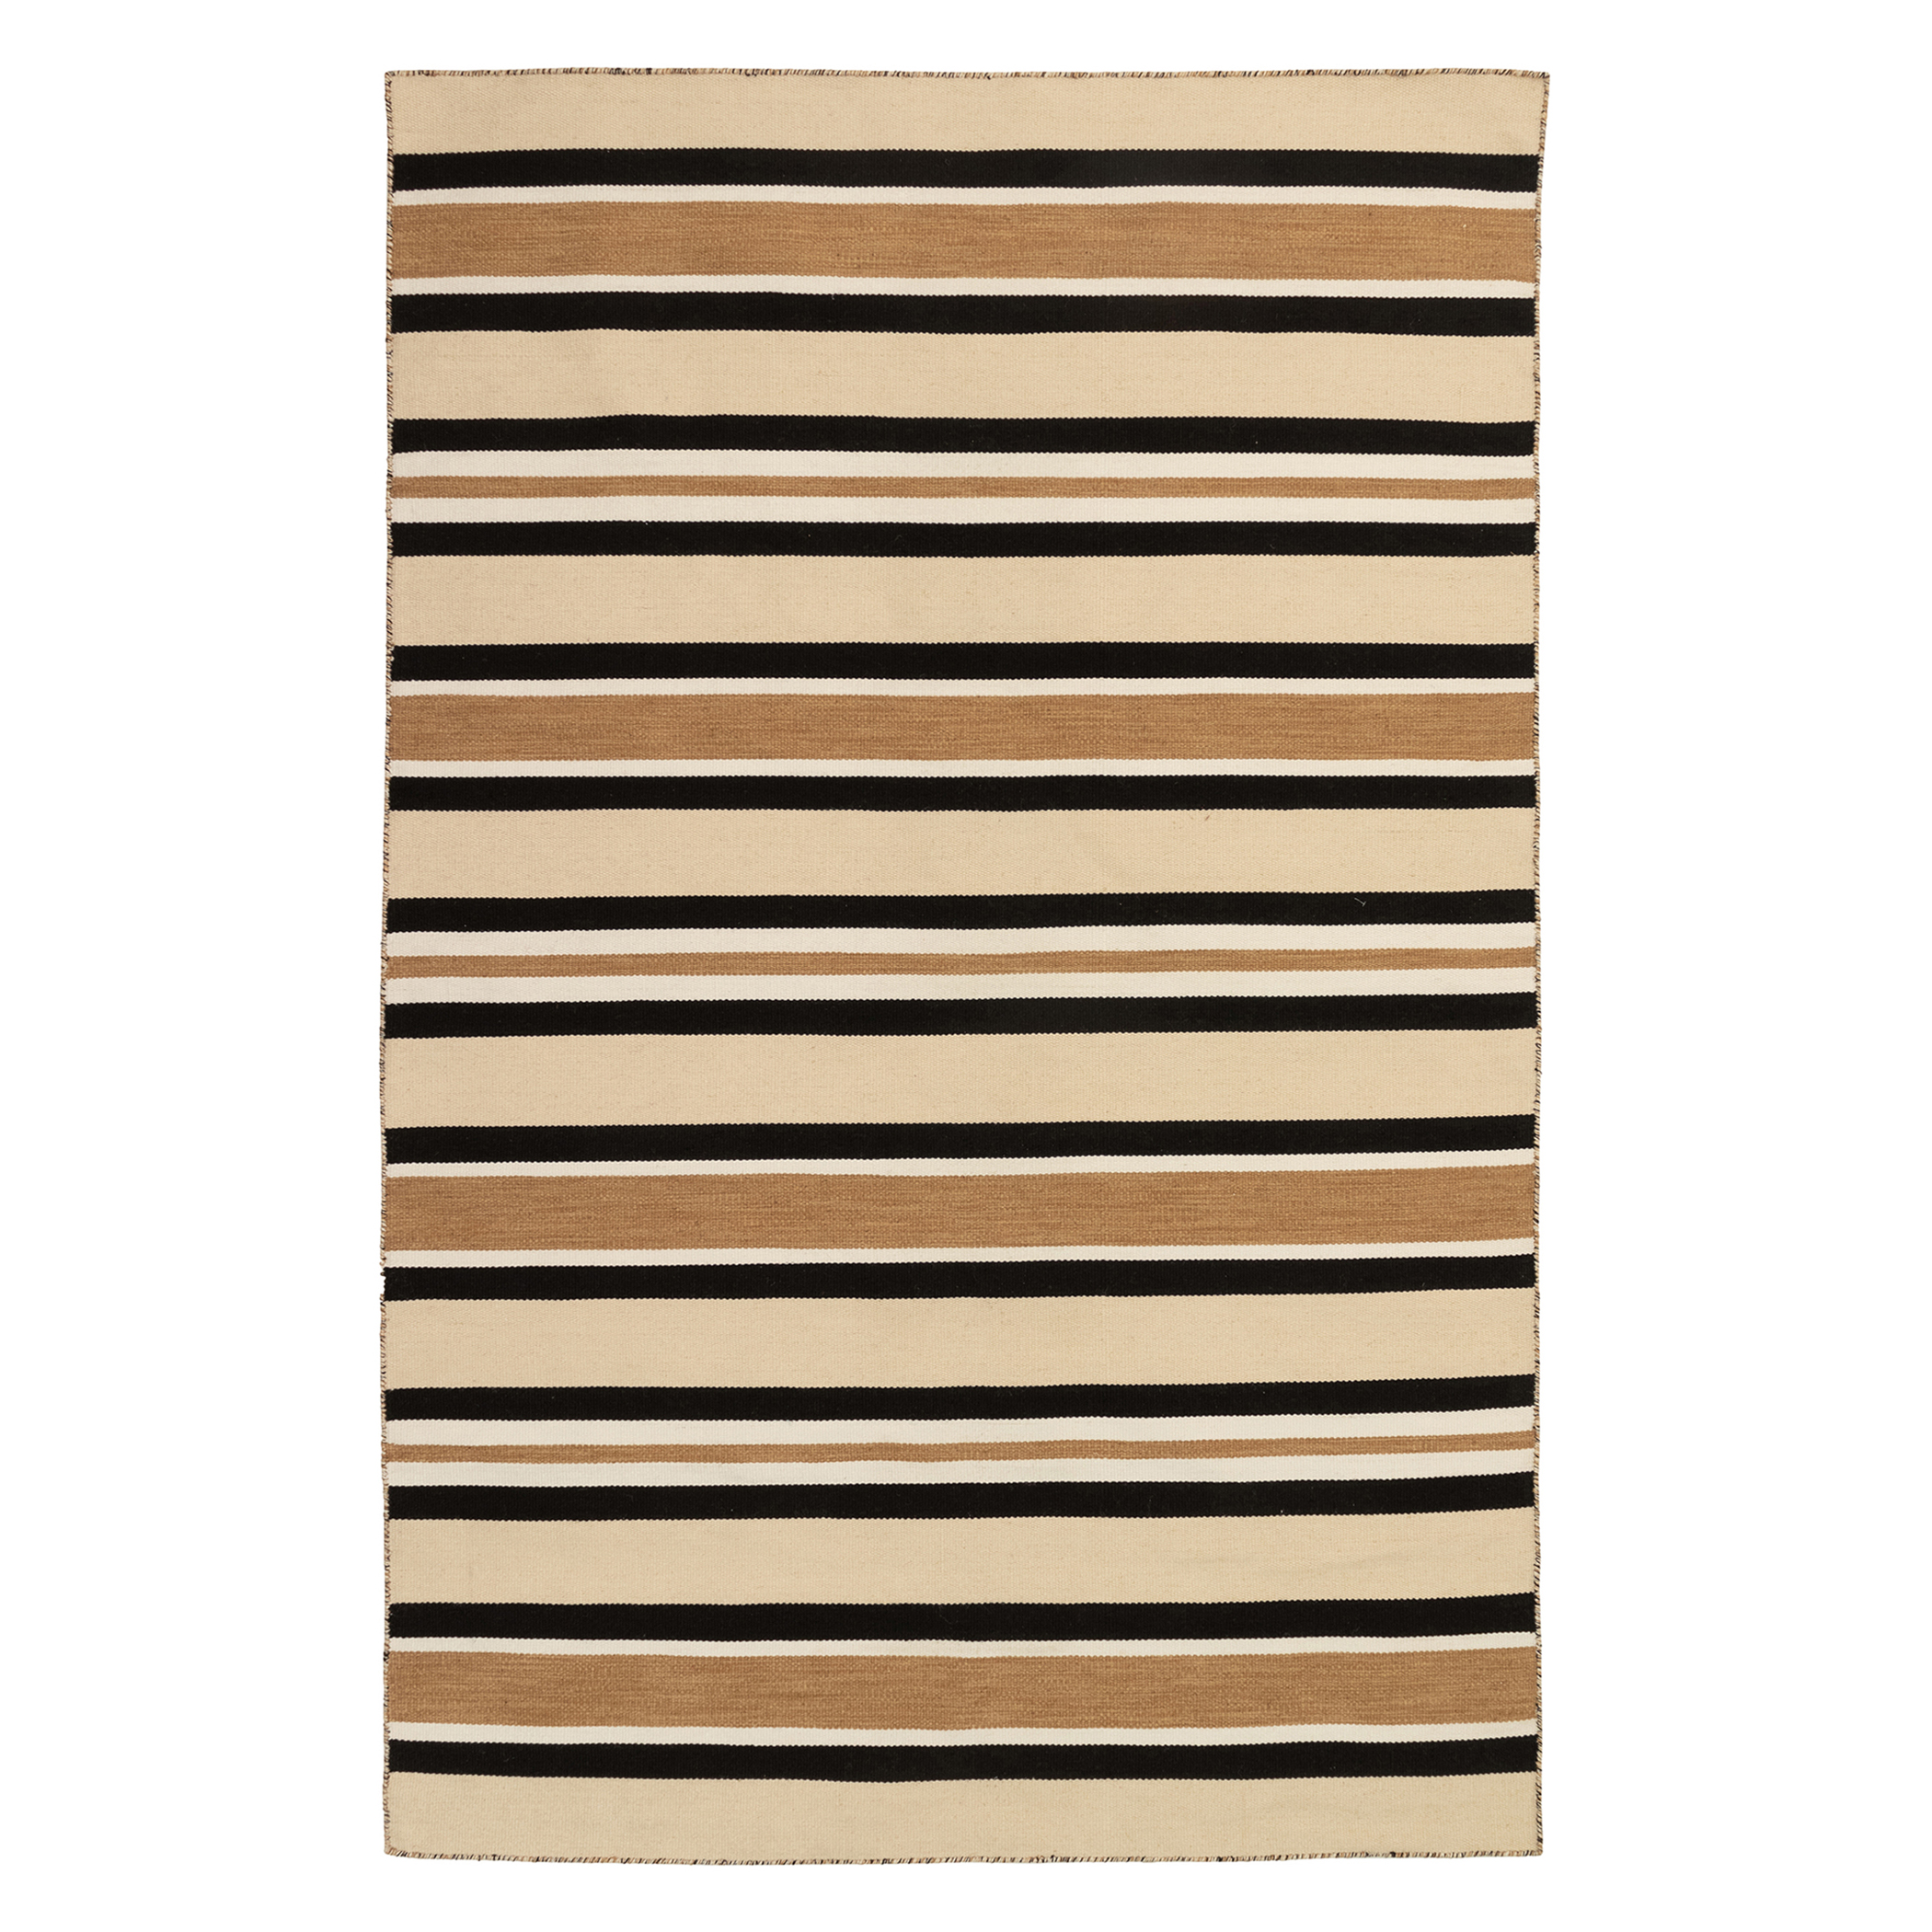 Variagated Stripe Outdoor Rug - Black